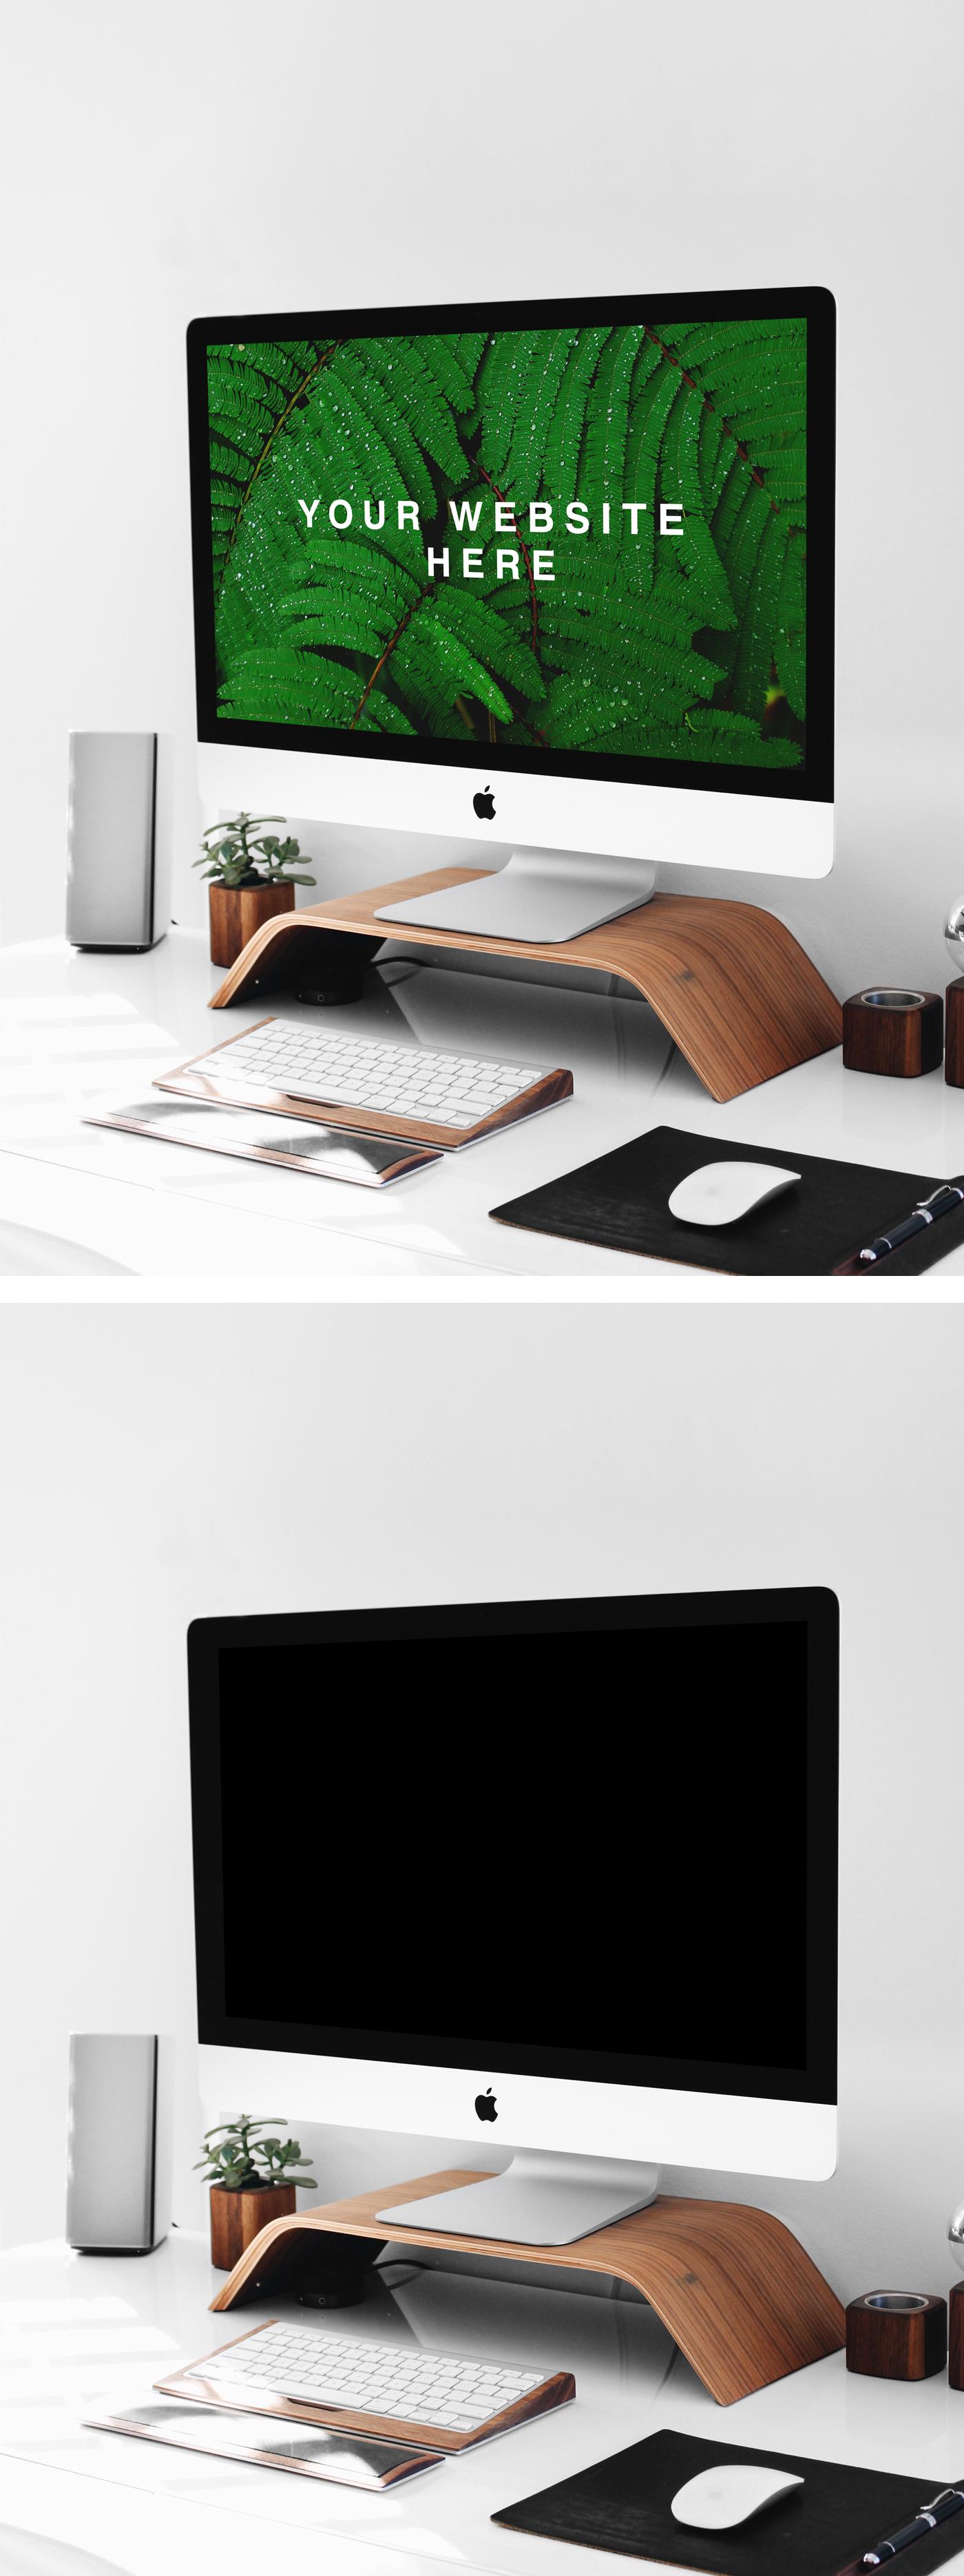 iMac on Stand PSD Mockup